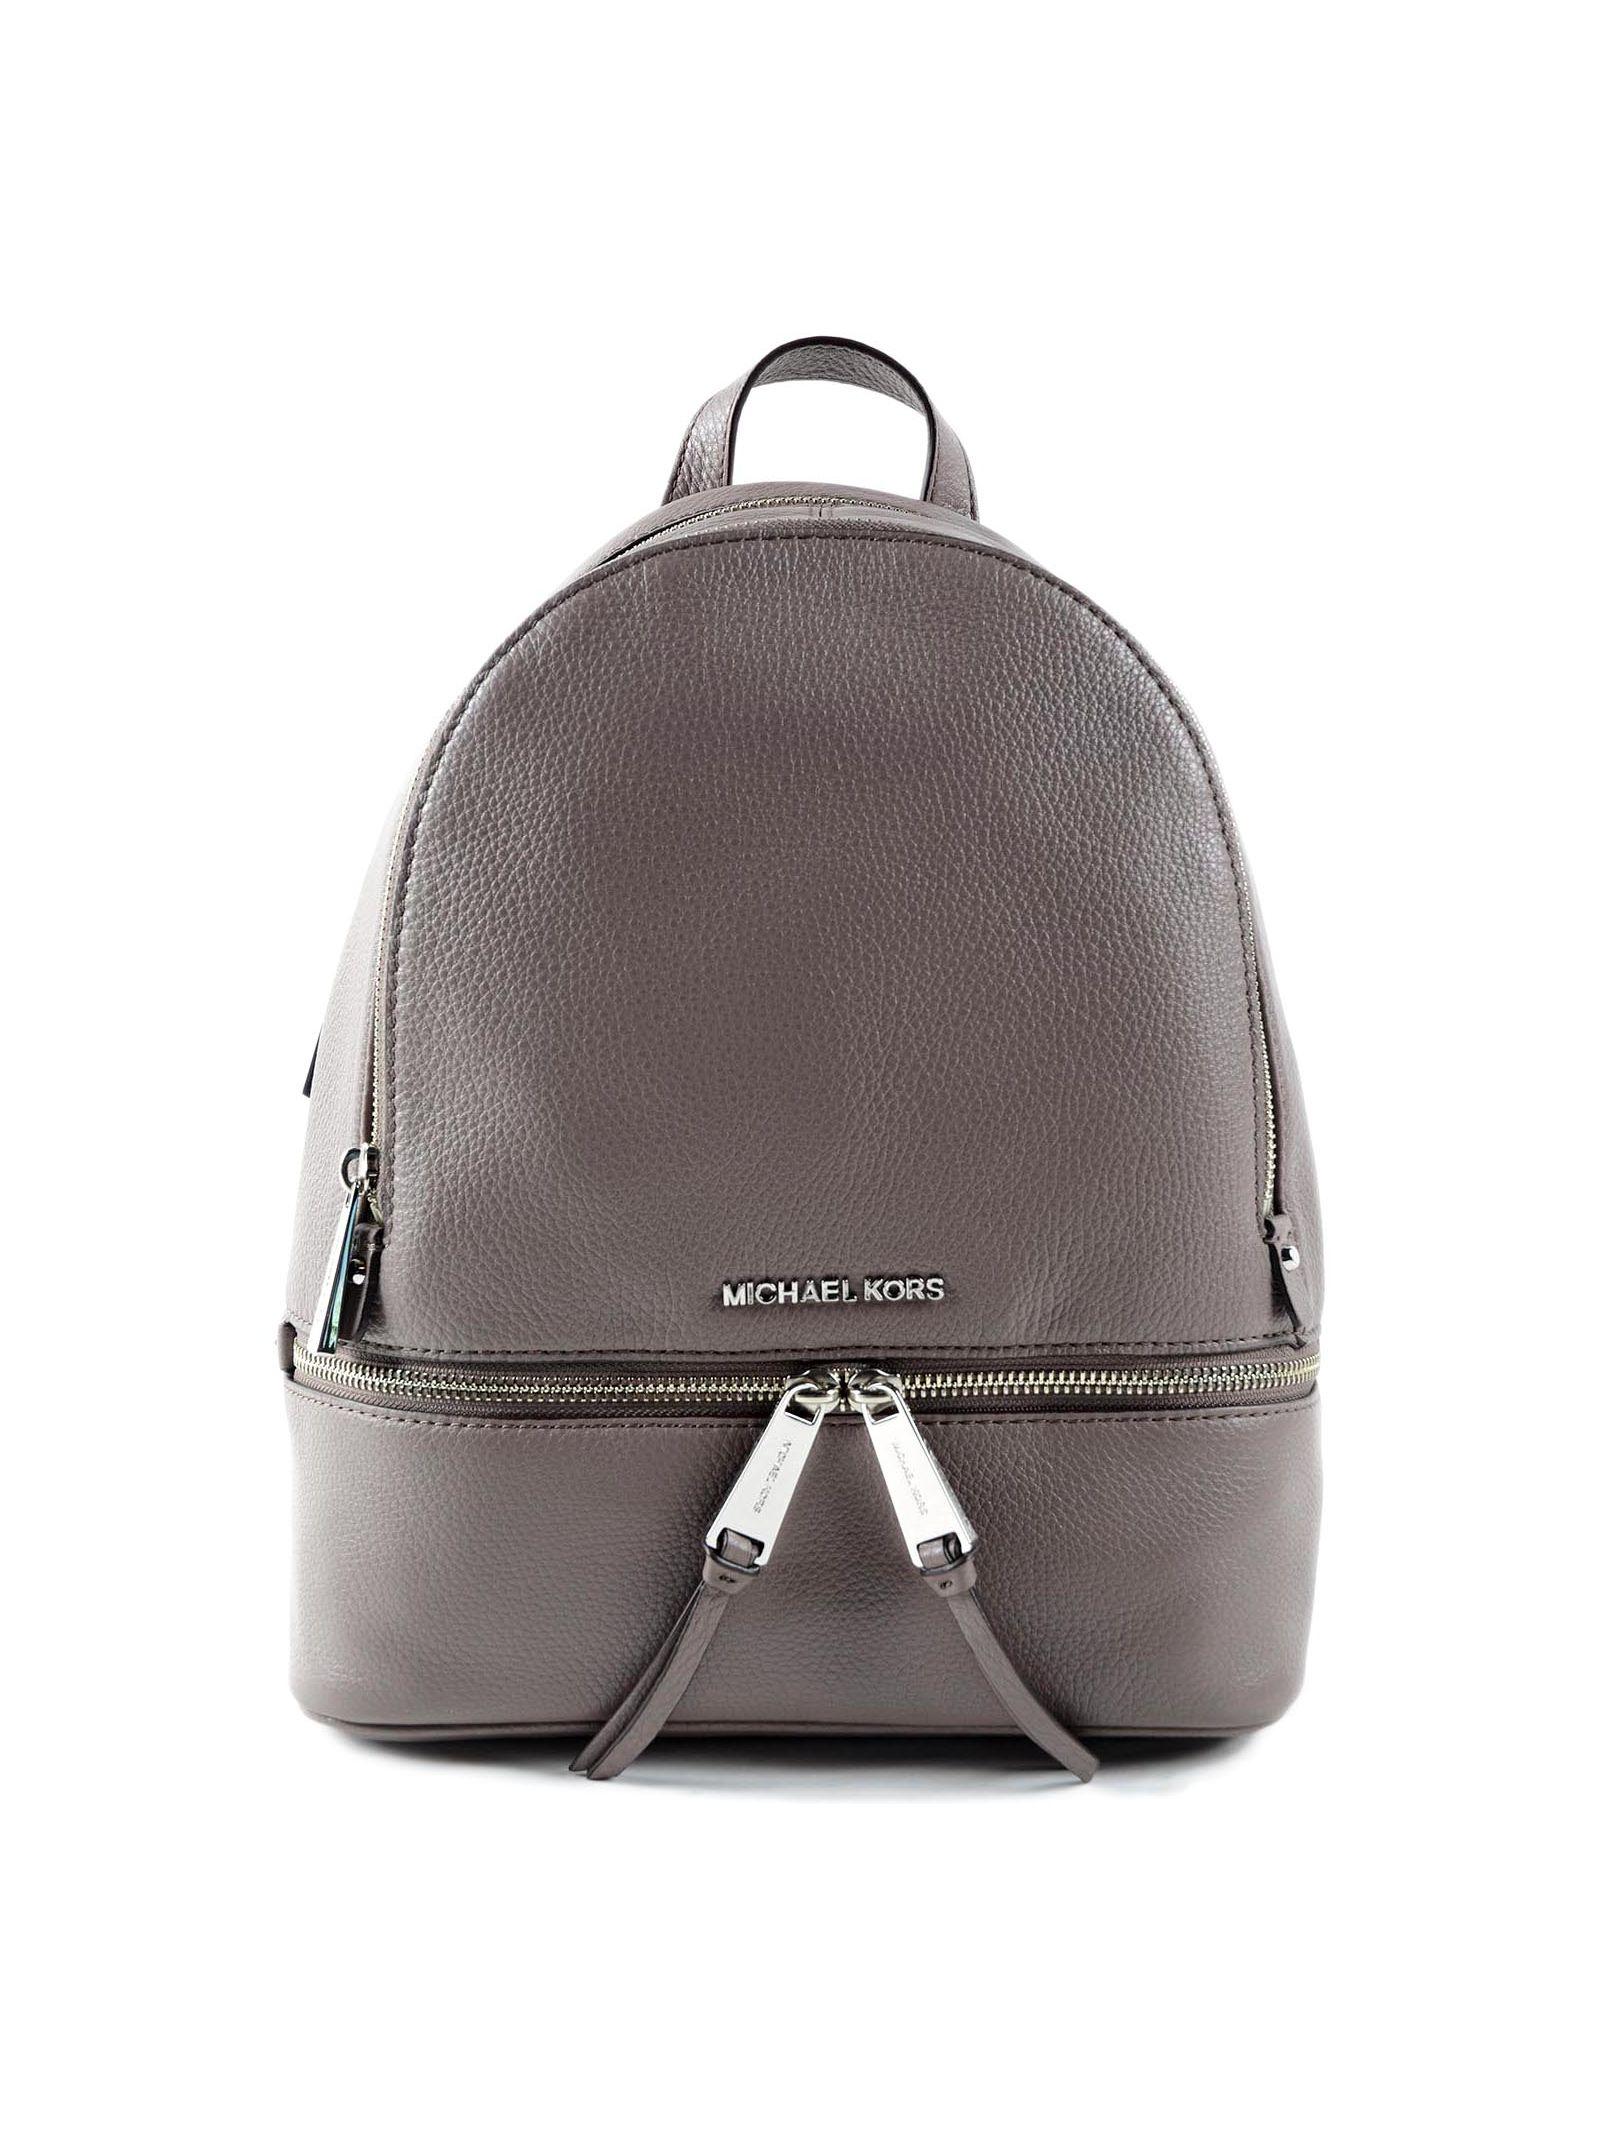 michael kors female michael kors rhea zip md backpack